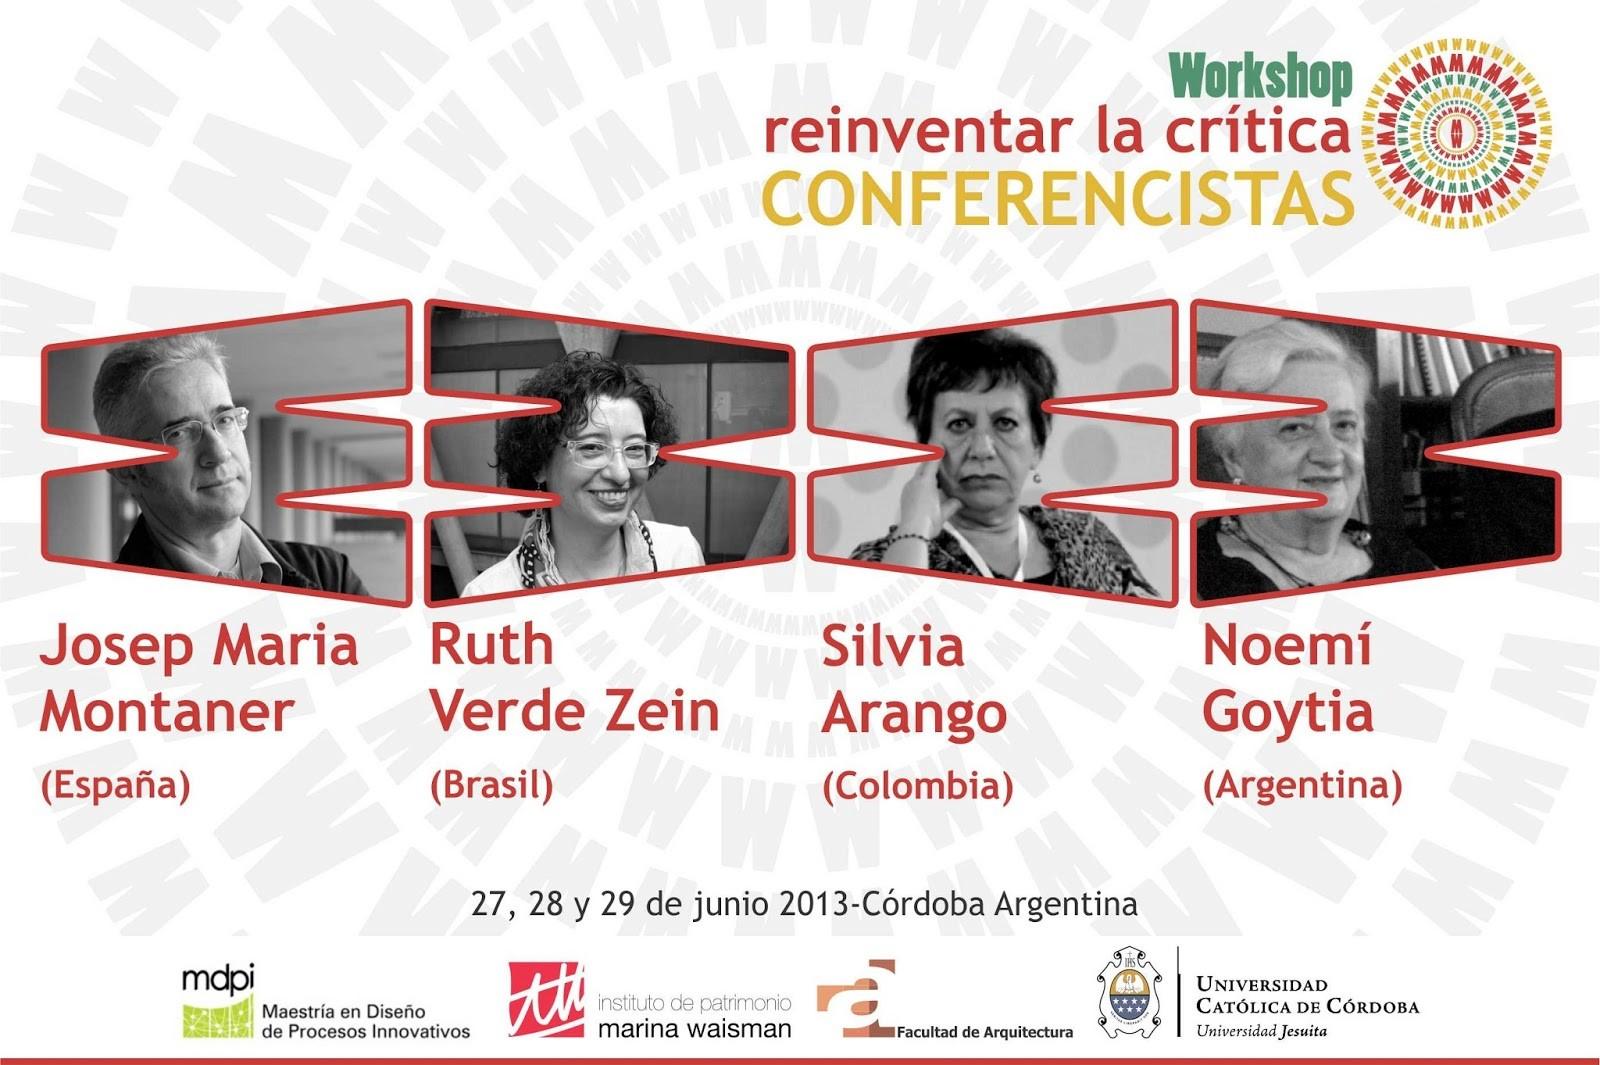 Workshop en Córdoba: Reinventar la Crítica